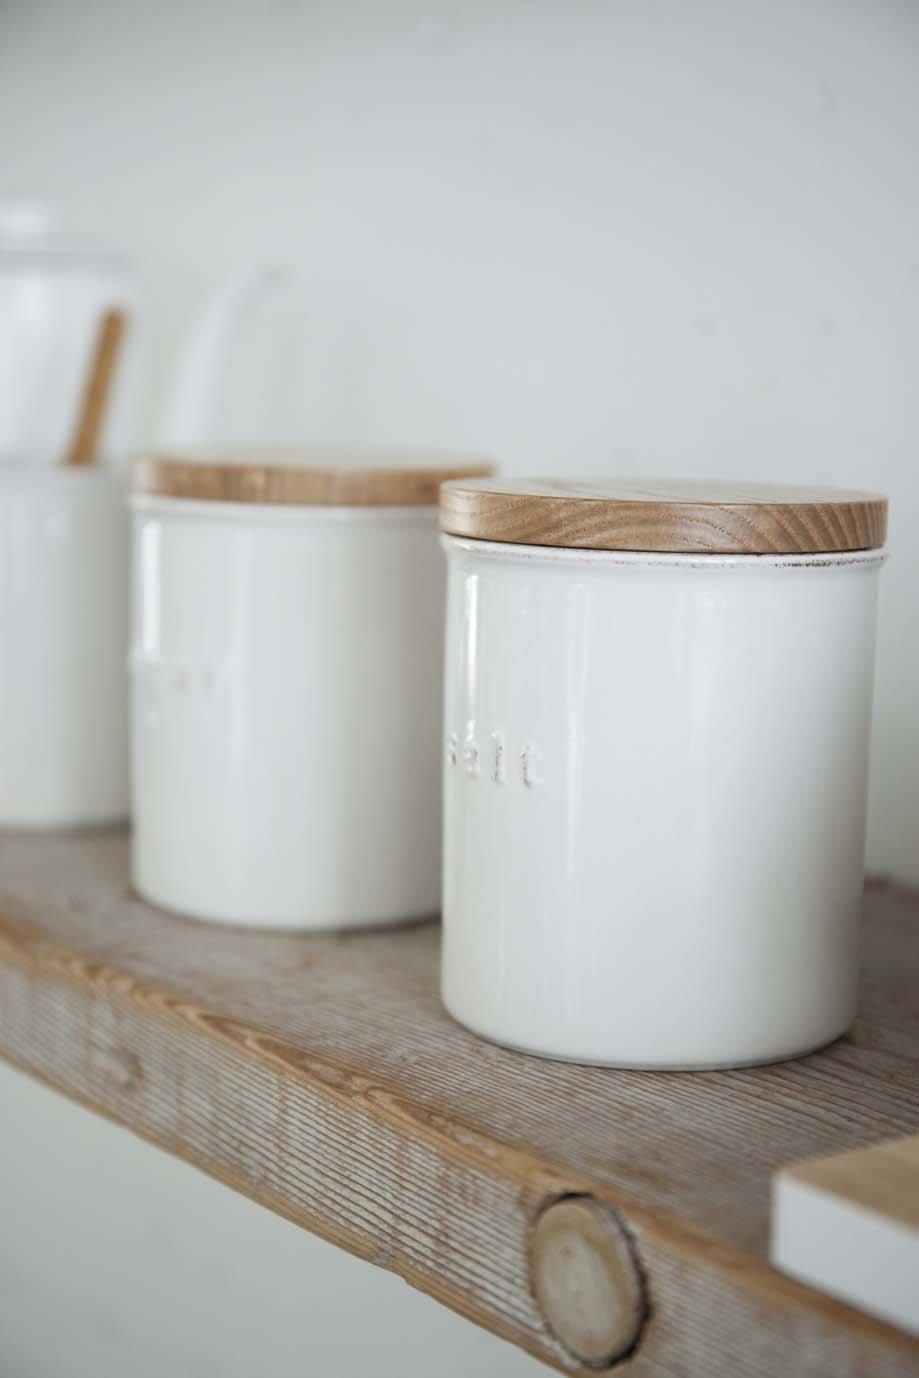 Yamazaki Home Tosca Ceramic Canister – Dry Food Kitchen Storage Container Organizer.